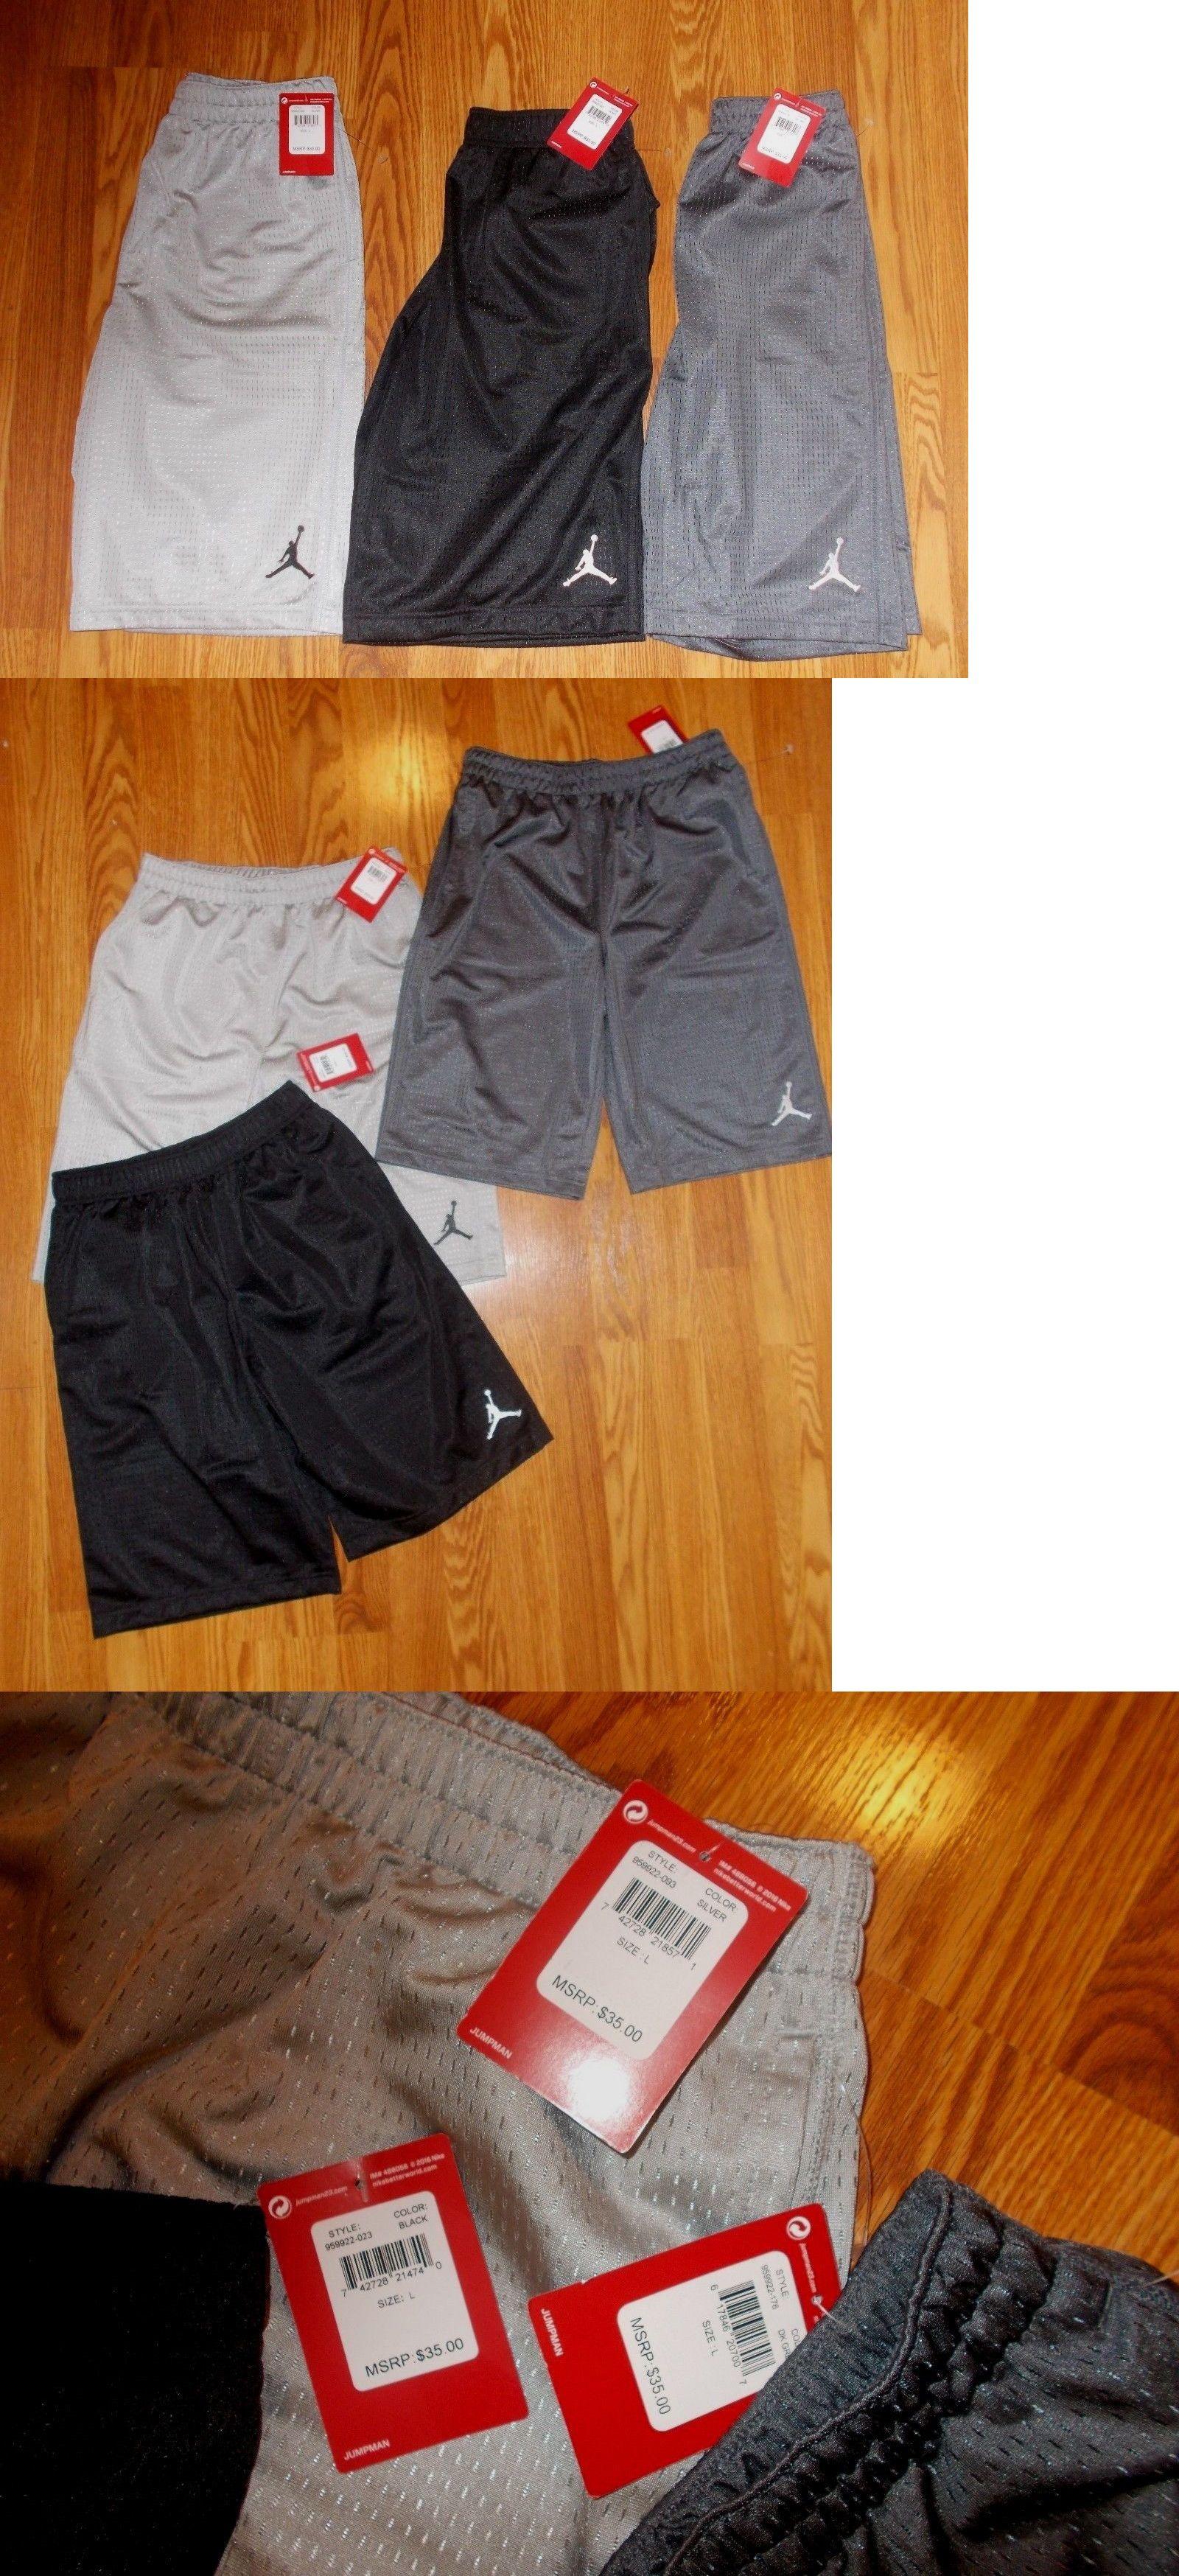 50e11d9a021 ... australia shorts 15615 new nike air jordan lot boy s size large basketball  shorts 3 pr discount short jordan dri fit ...